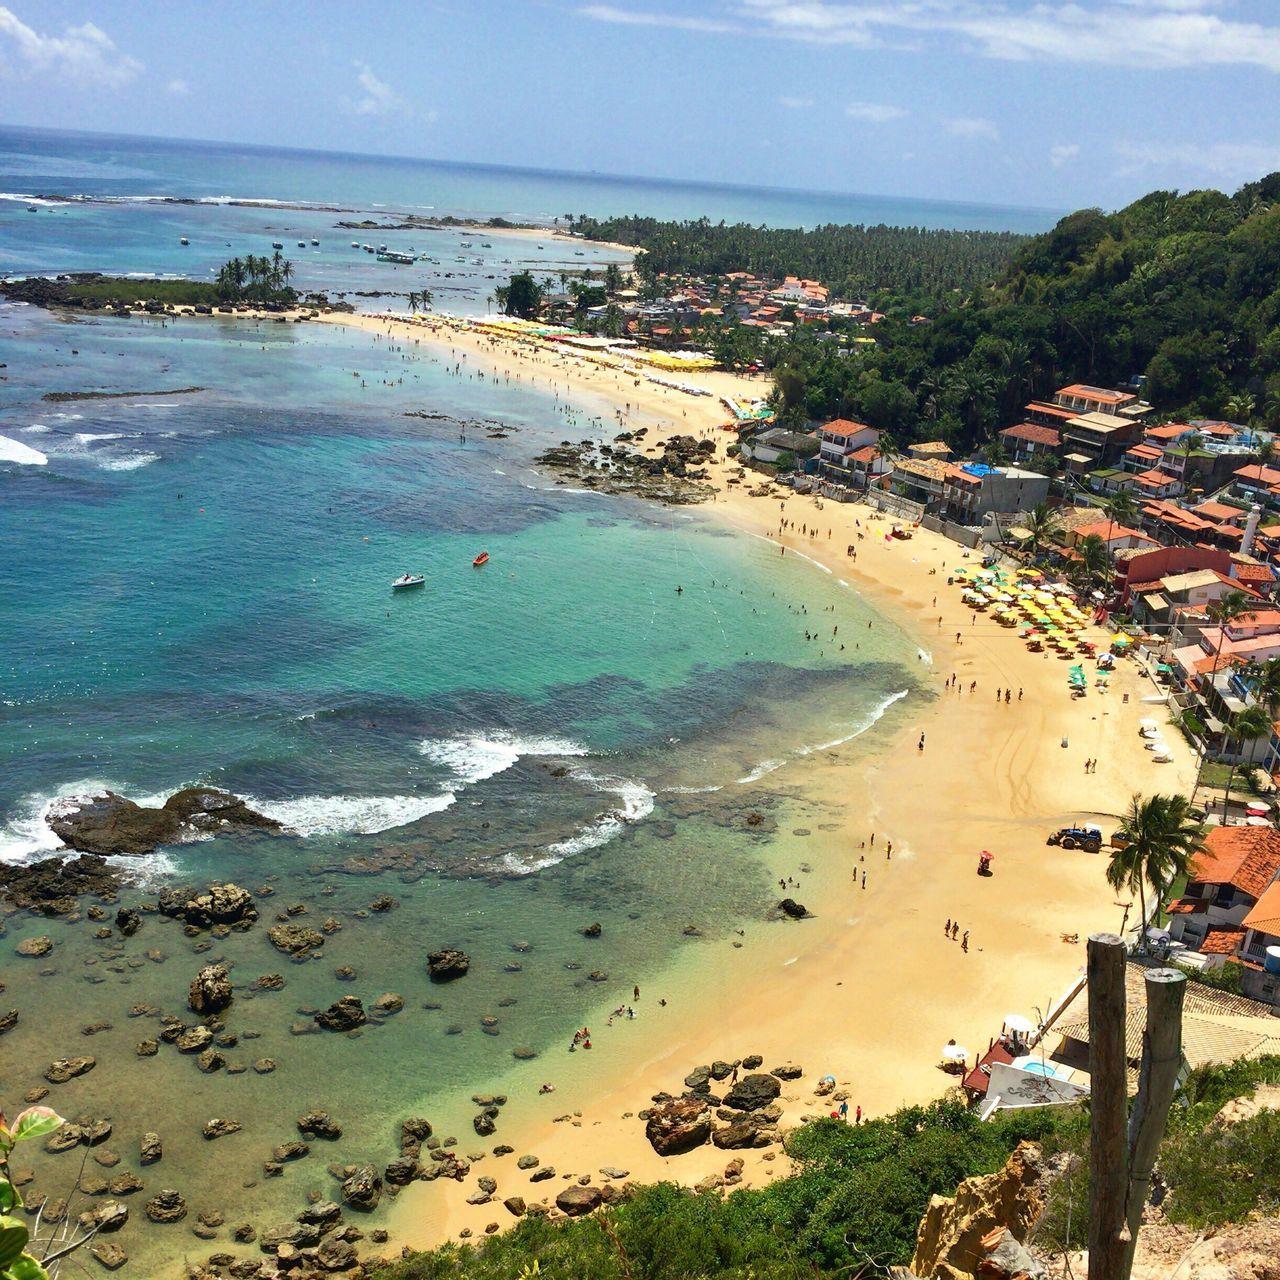 Primeira praia morro de São Paulo. Bahia. Beach Water Sand Tirolesa EyeEmNewHere